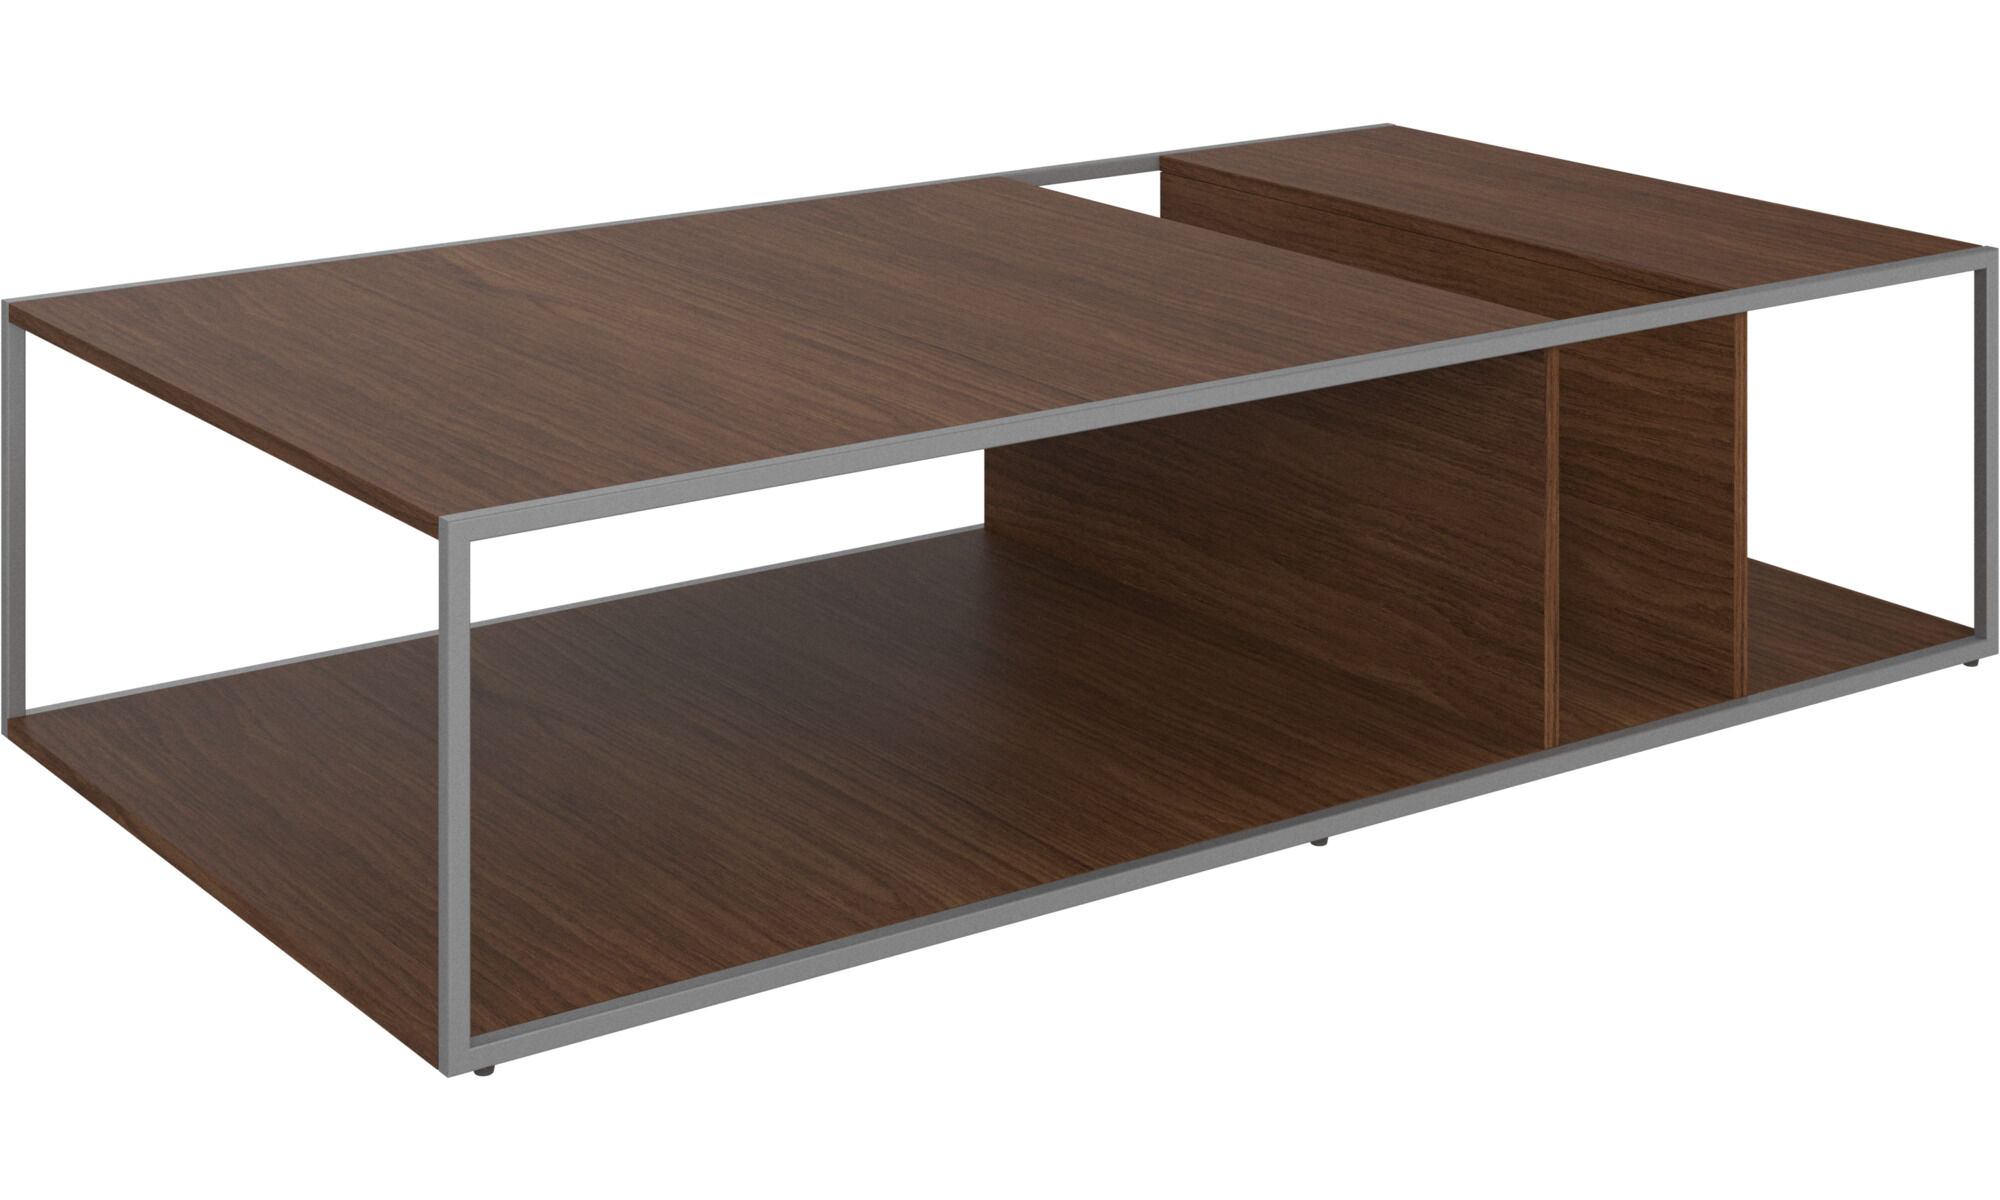 Philadelphia coffee table in walnut veneer